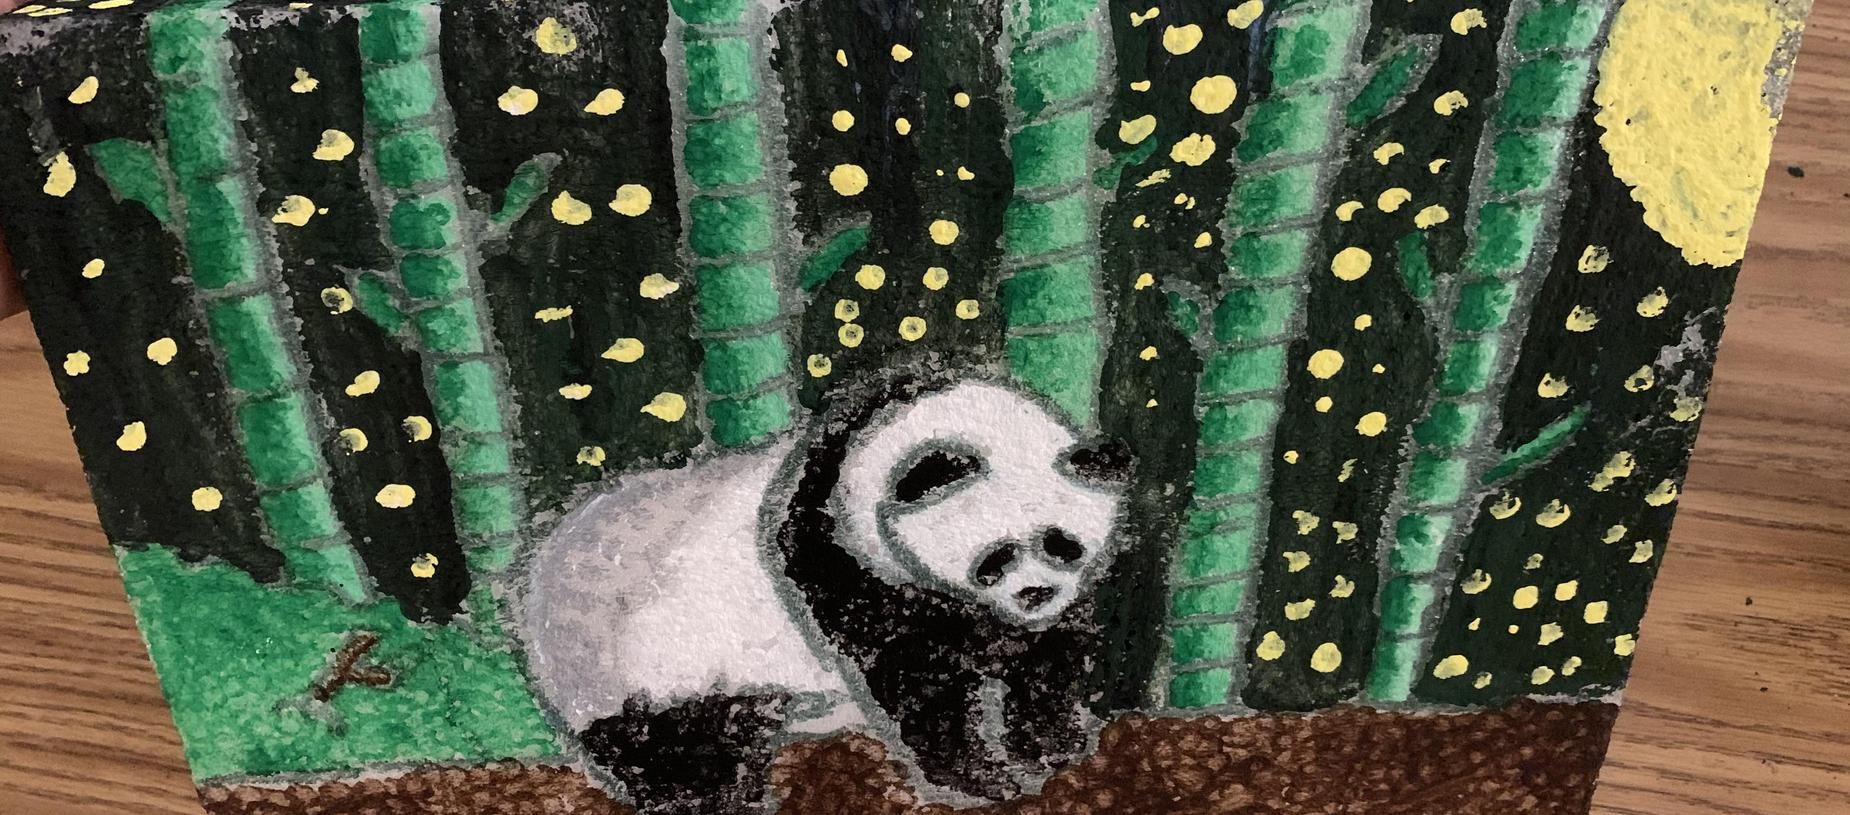 Student Pointillism Art Project